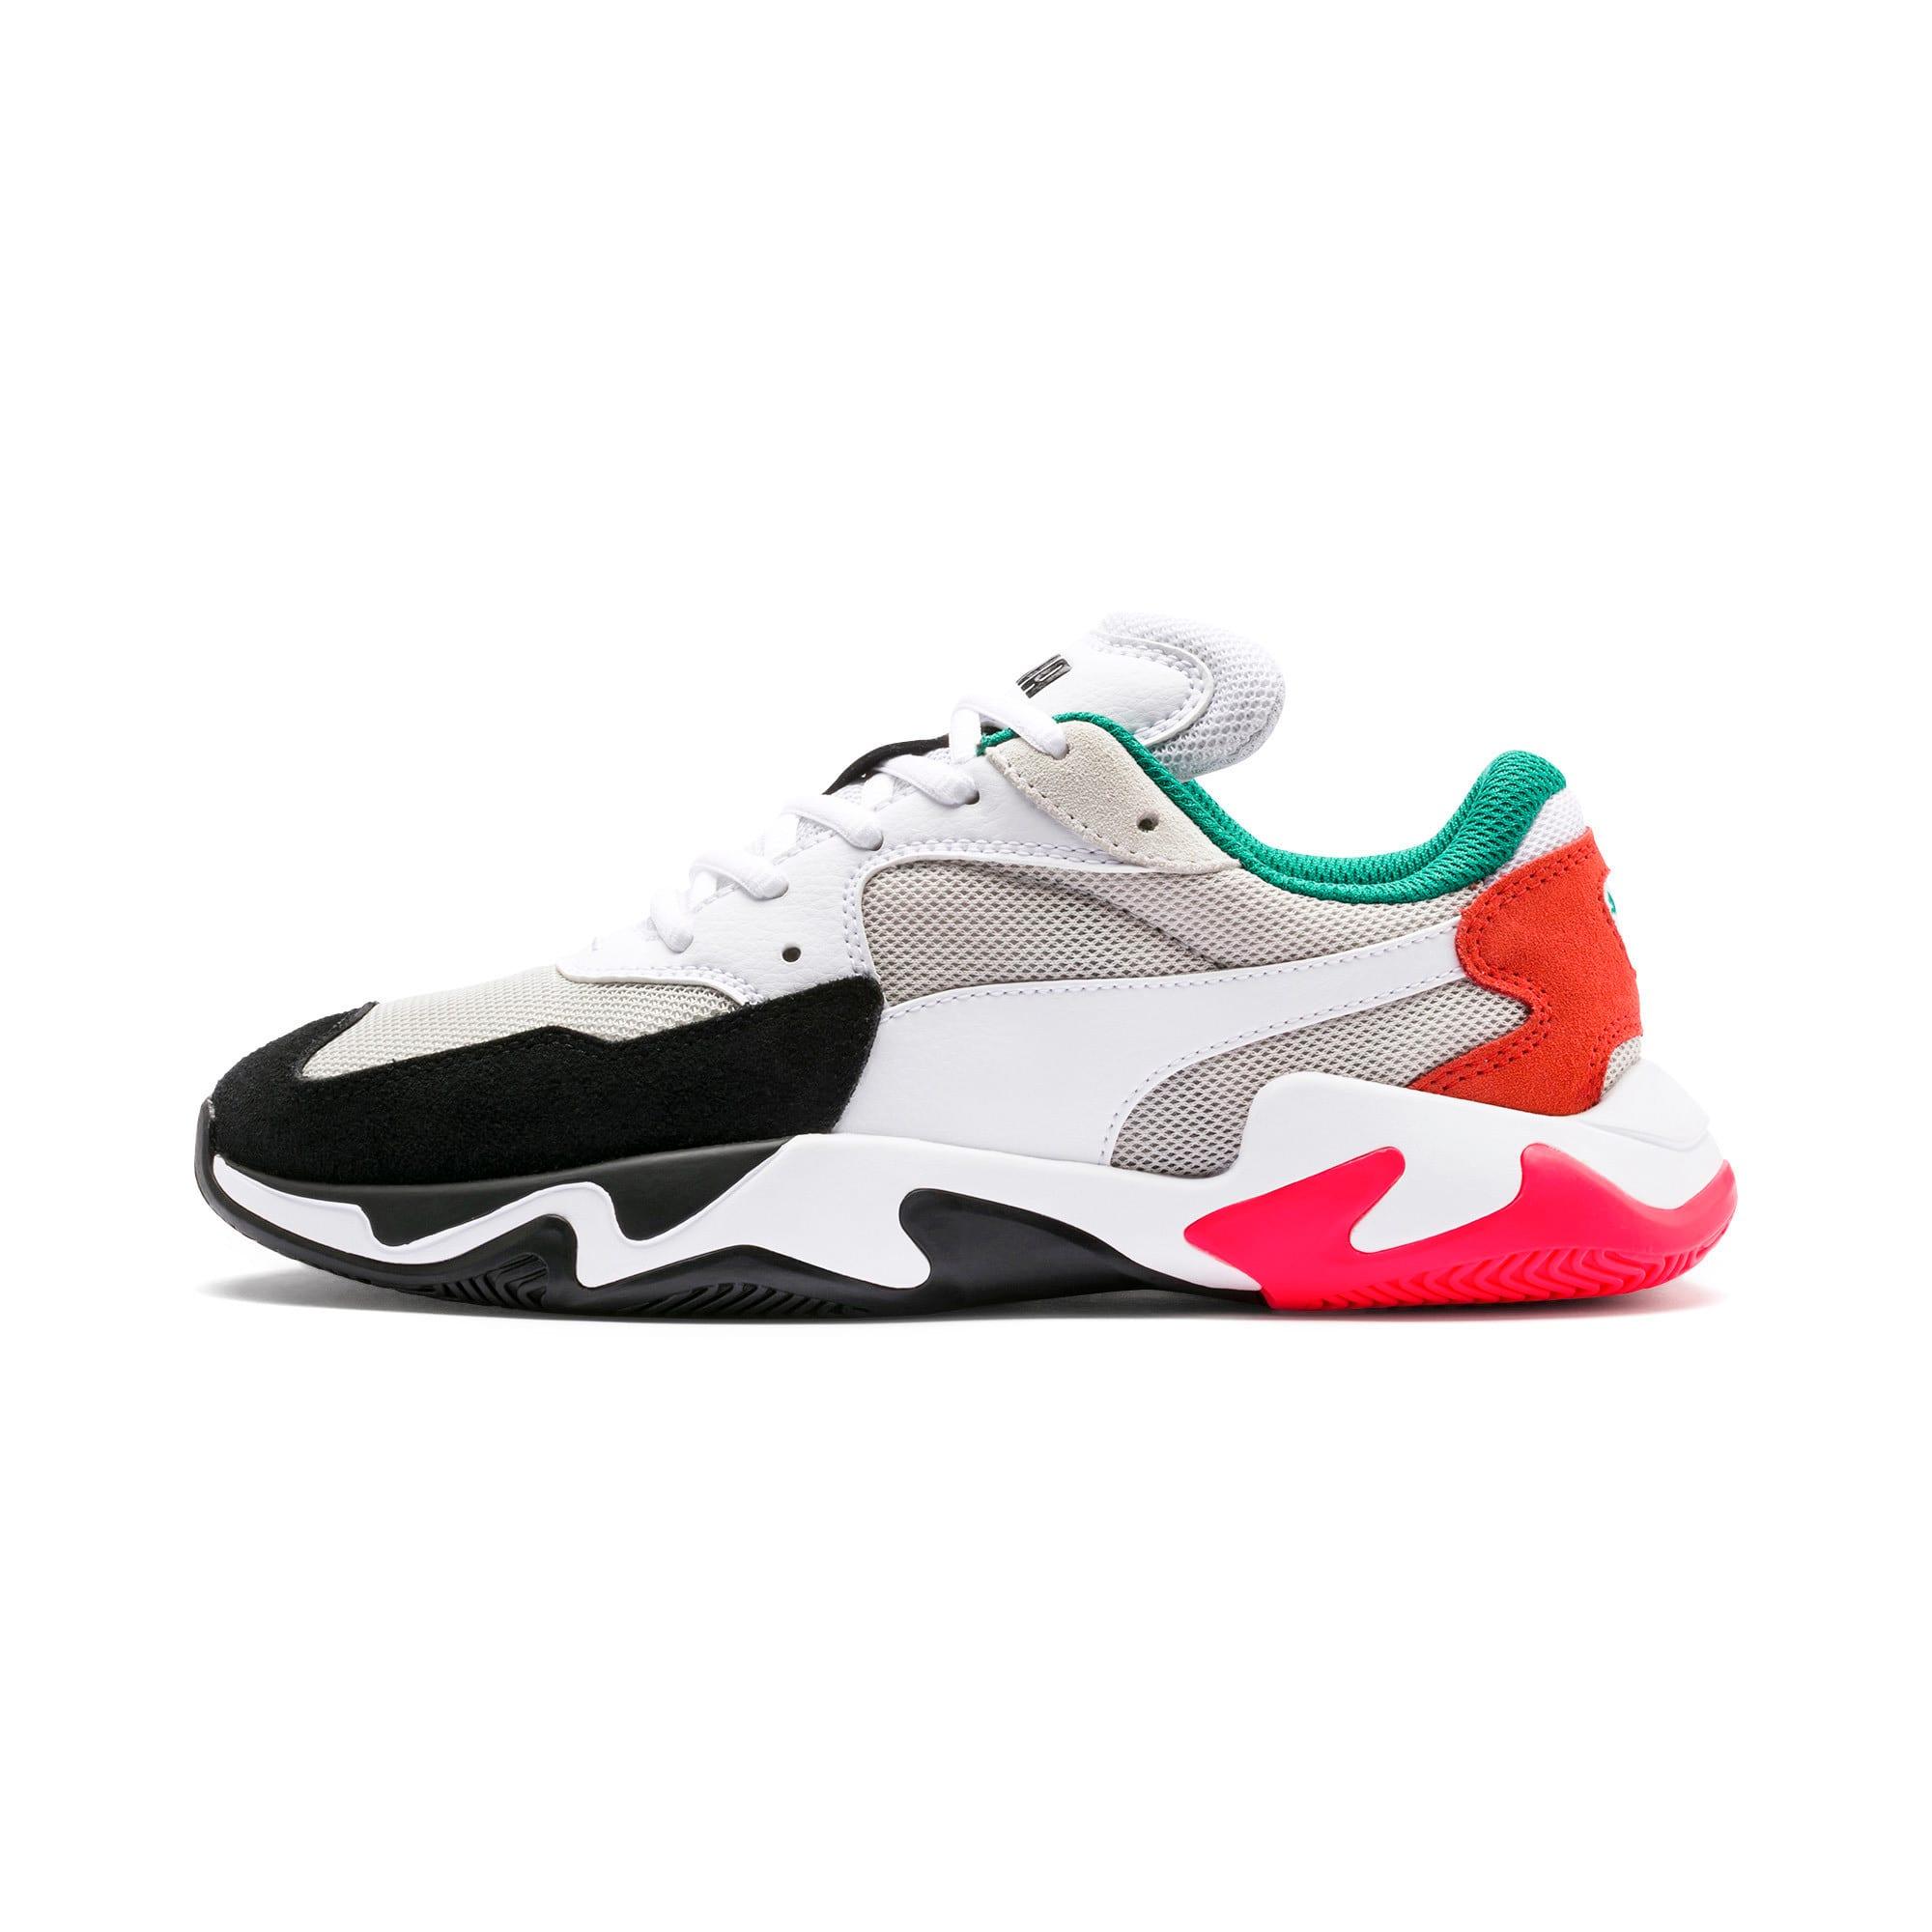 Thumbnail 1 of Storm Adrenaline Sneaker, Puma Black-Gray Violet, medium